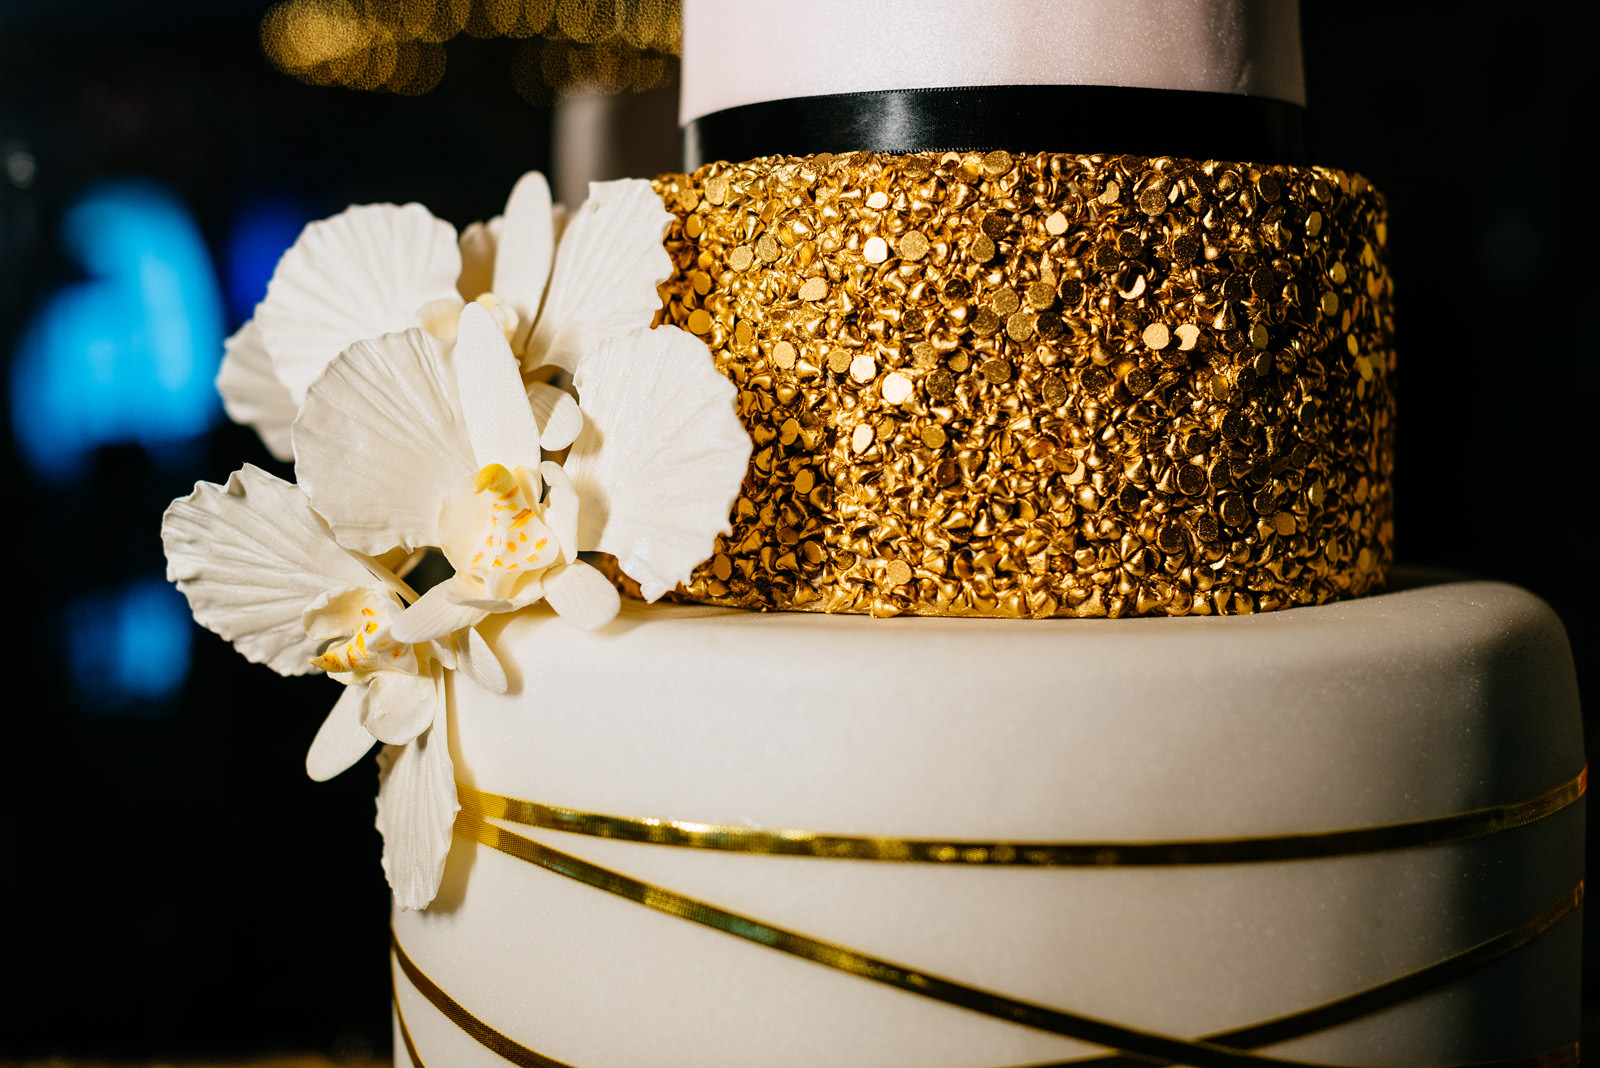 greenbrier resort golden wedding cake